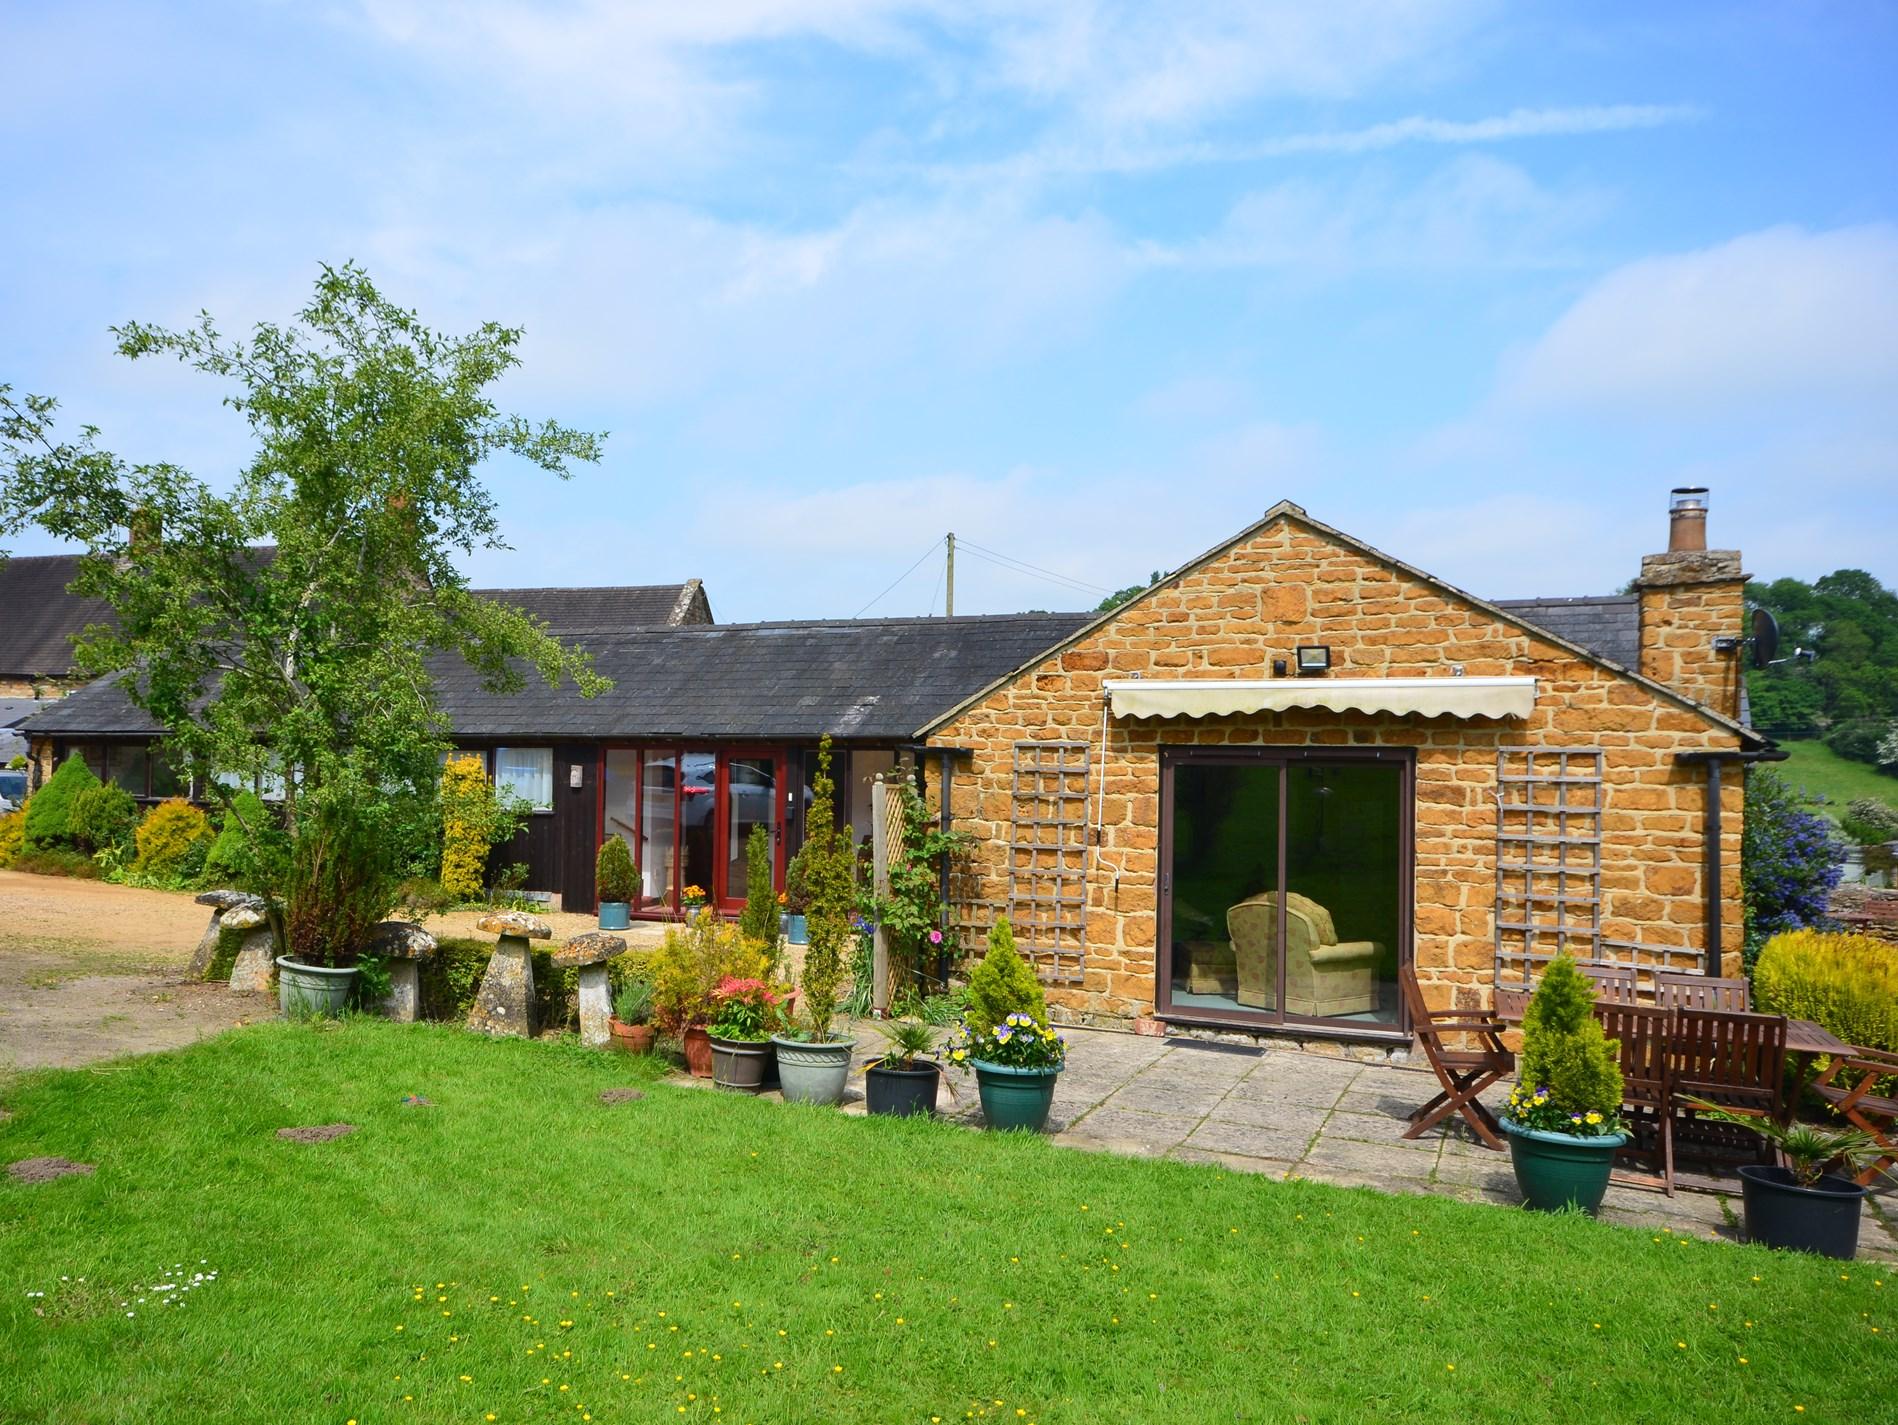 Ferienhaus in Shipston-on-Stour